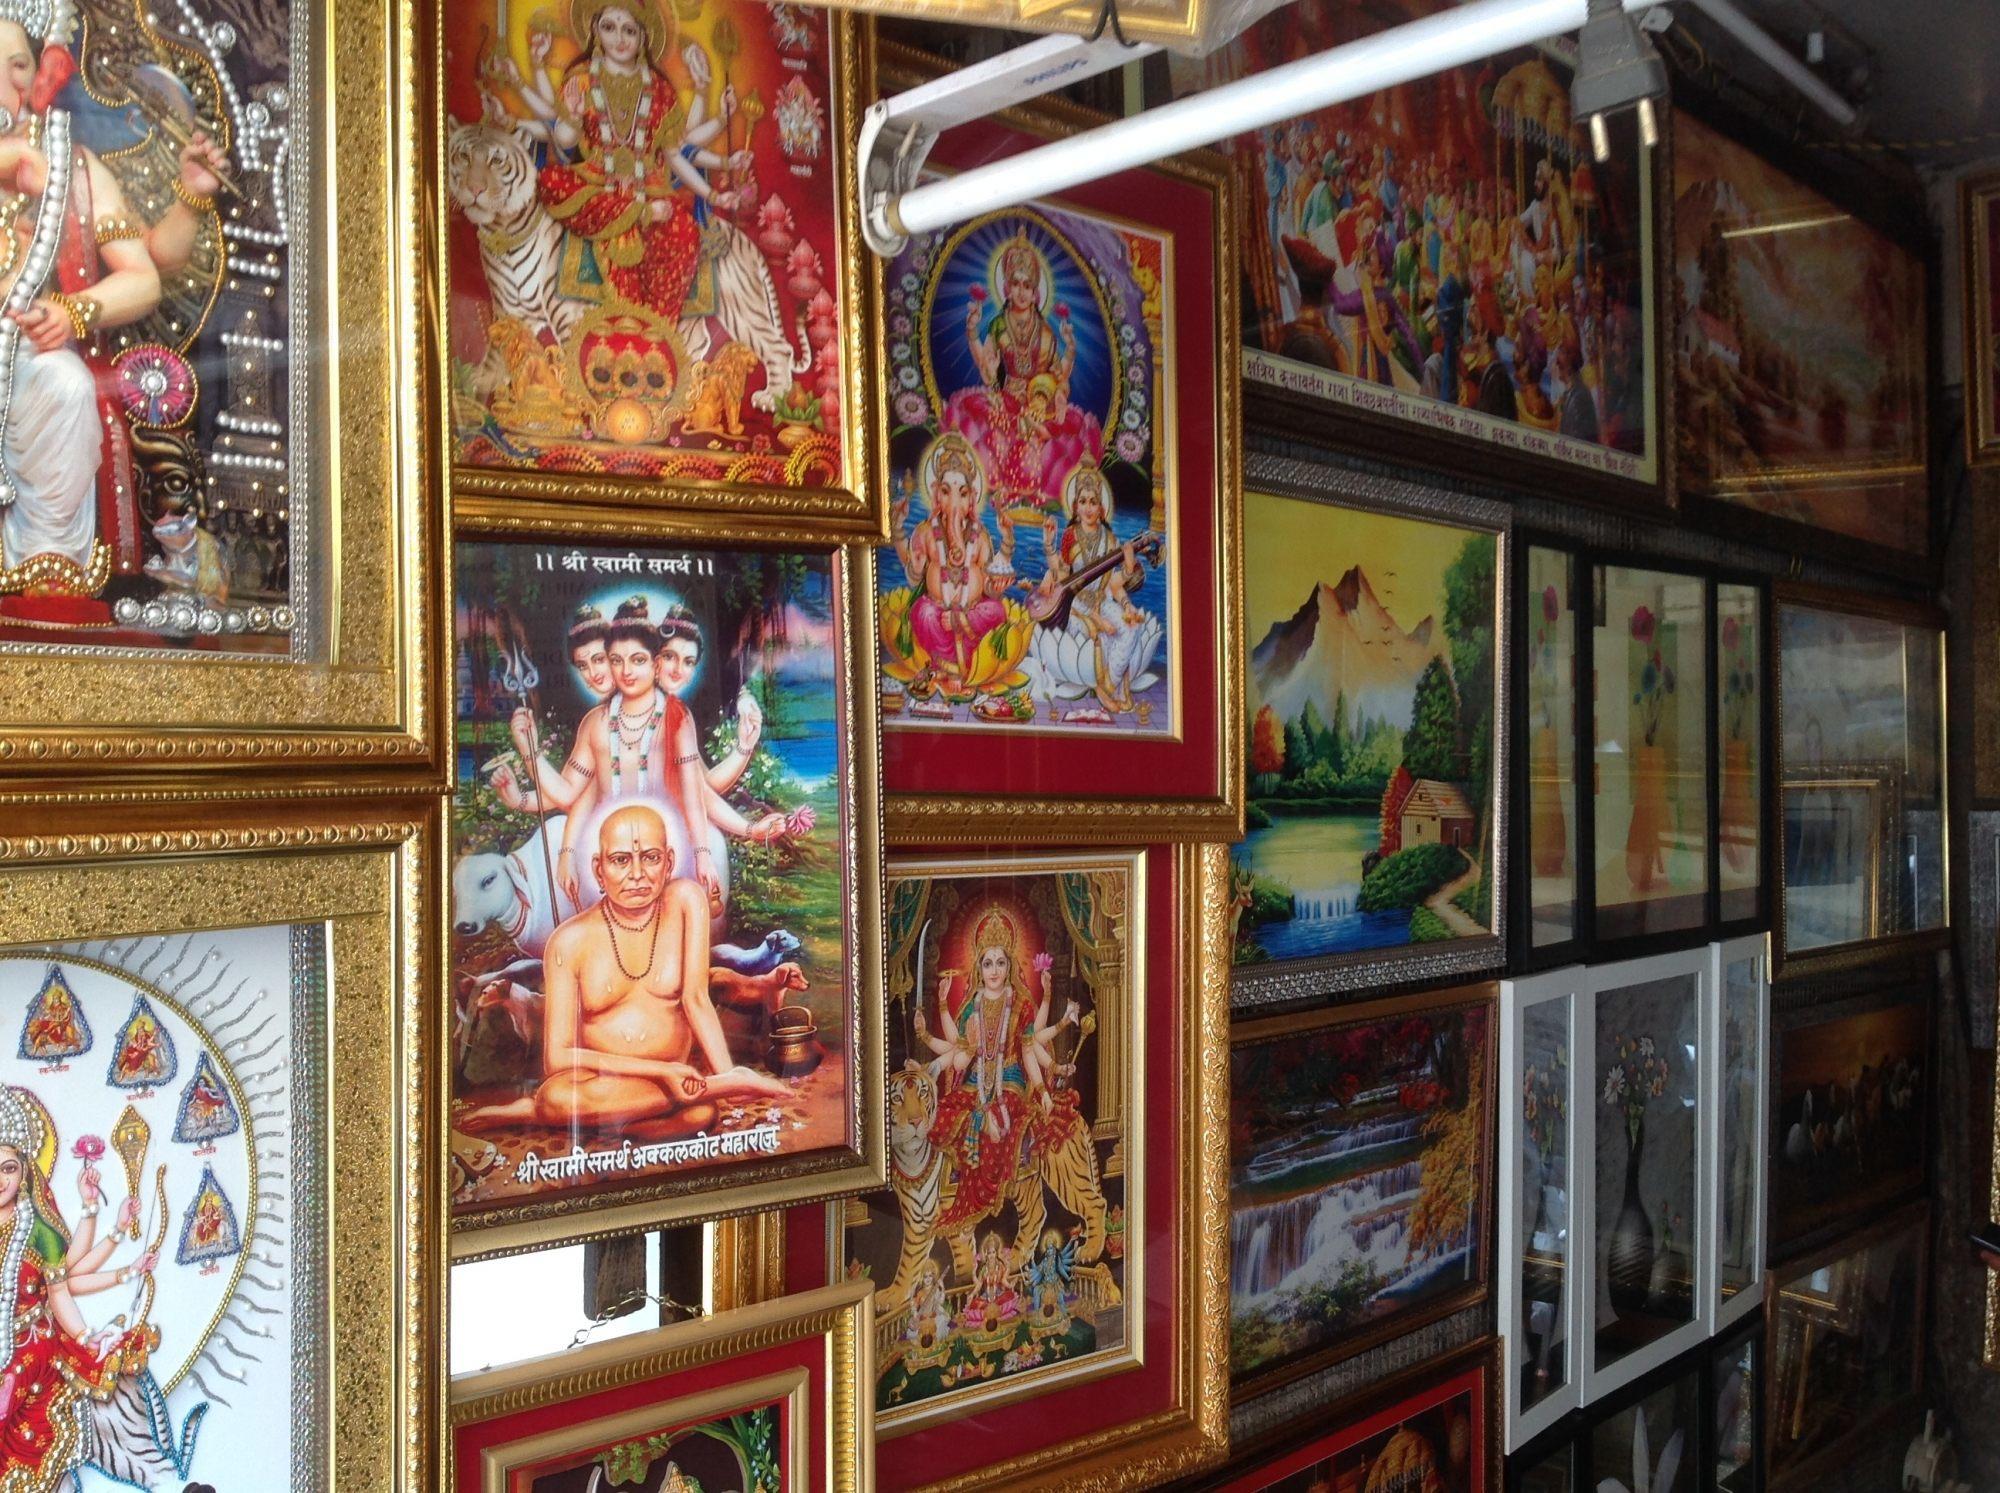 24ce0c0e7fd Top 10 Photo Frame Wholesalers in Ghatkopar West - Best Picture Frame  Wholesalers Mumbai - Justdial